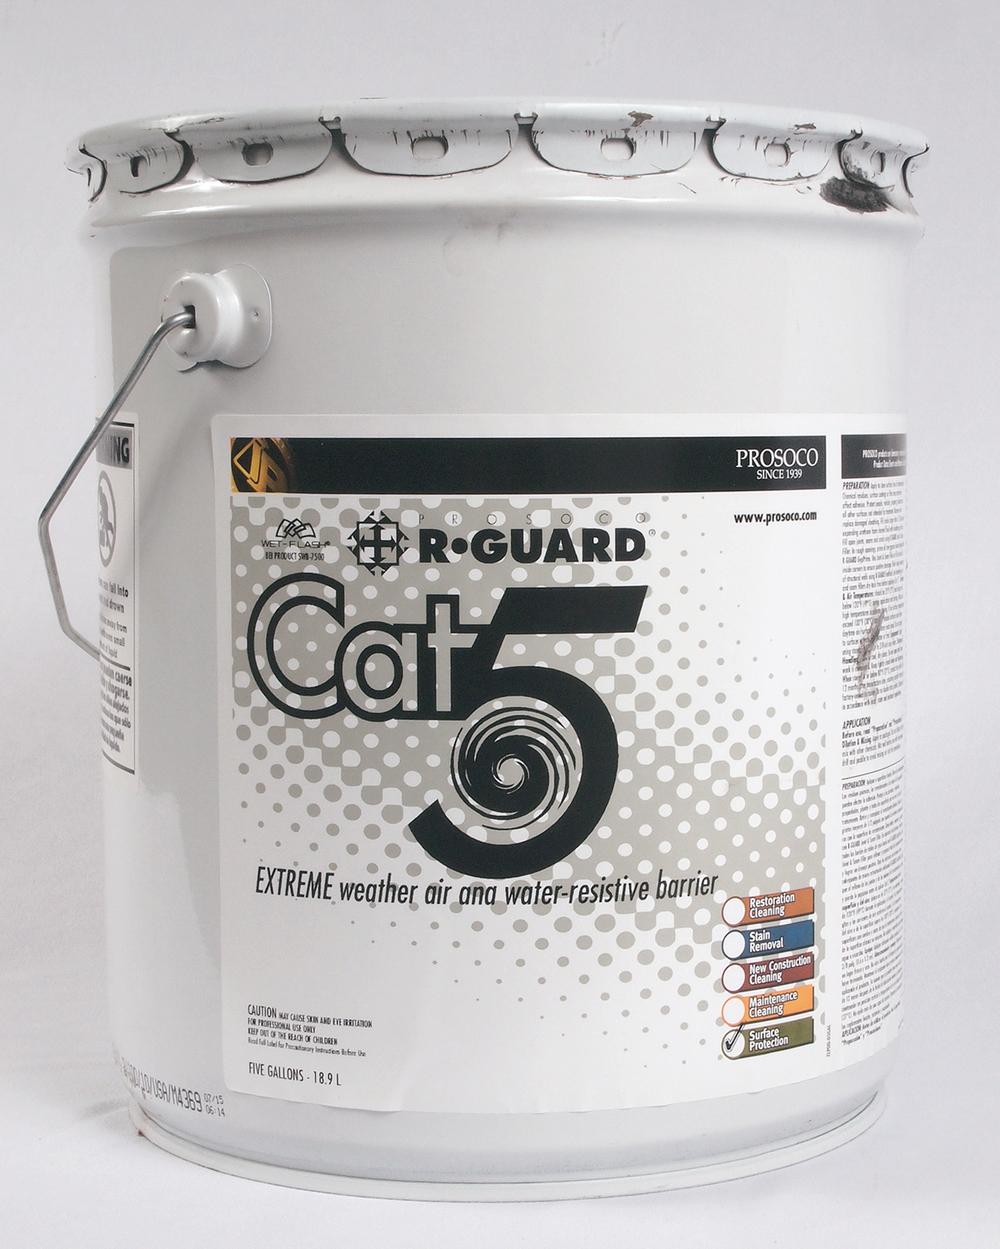 Cat-5 5gal.jpg